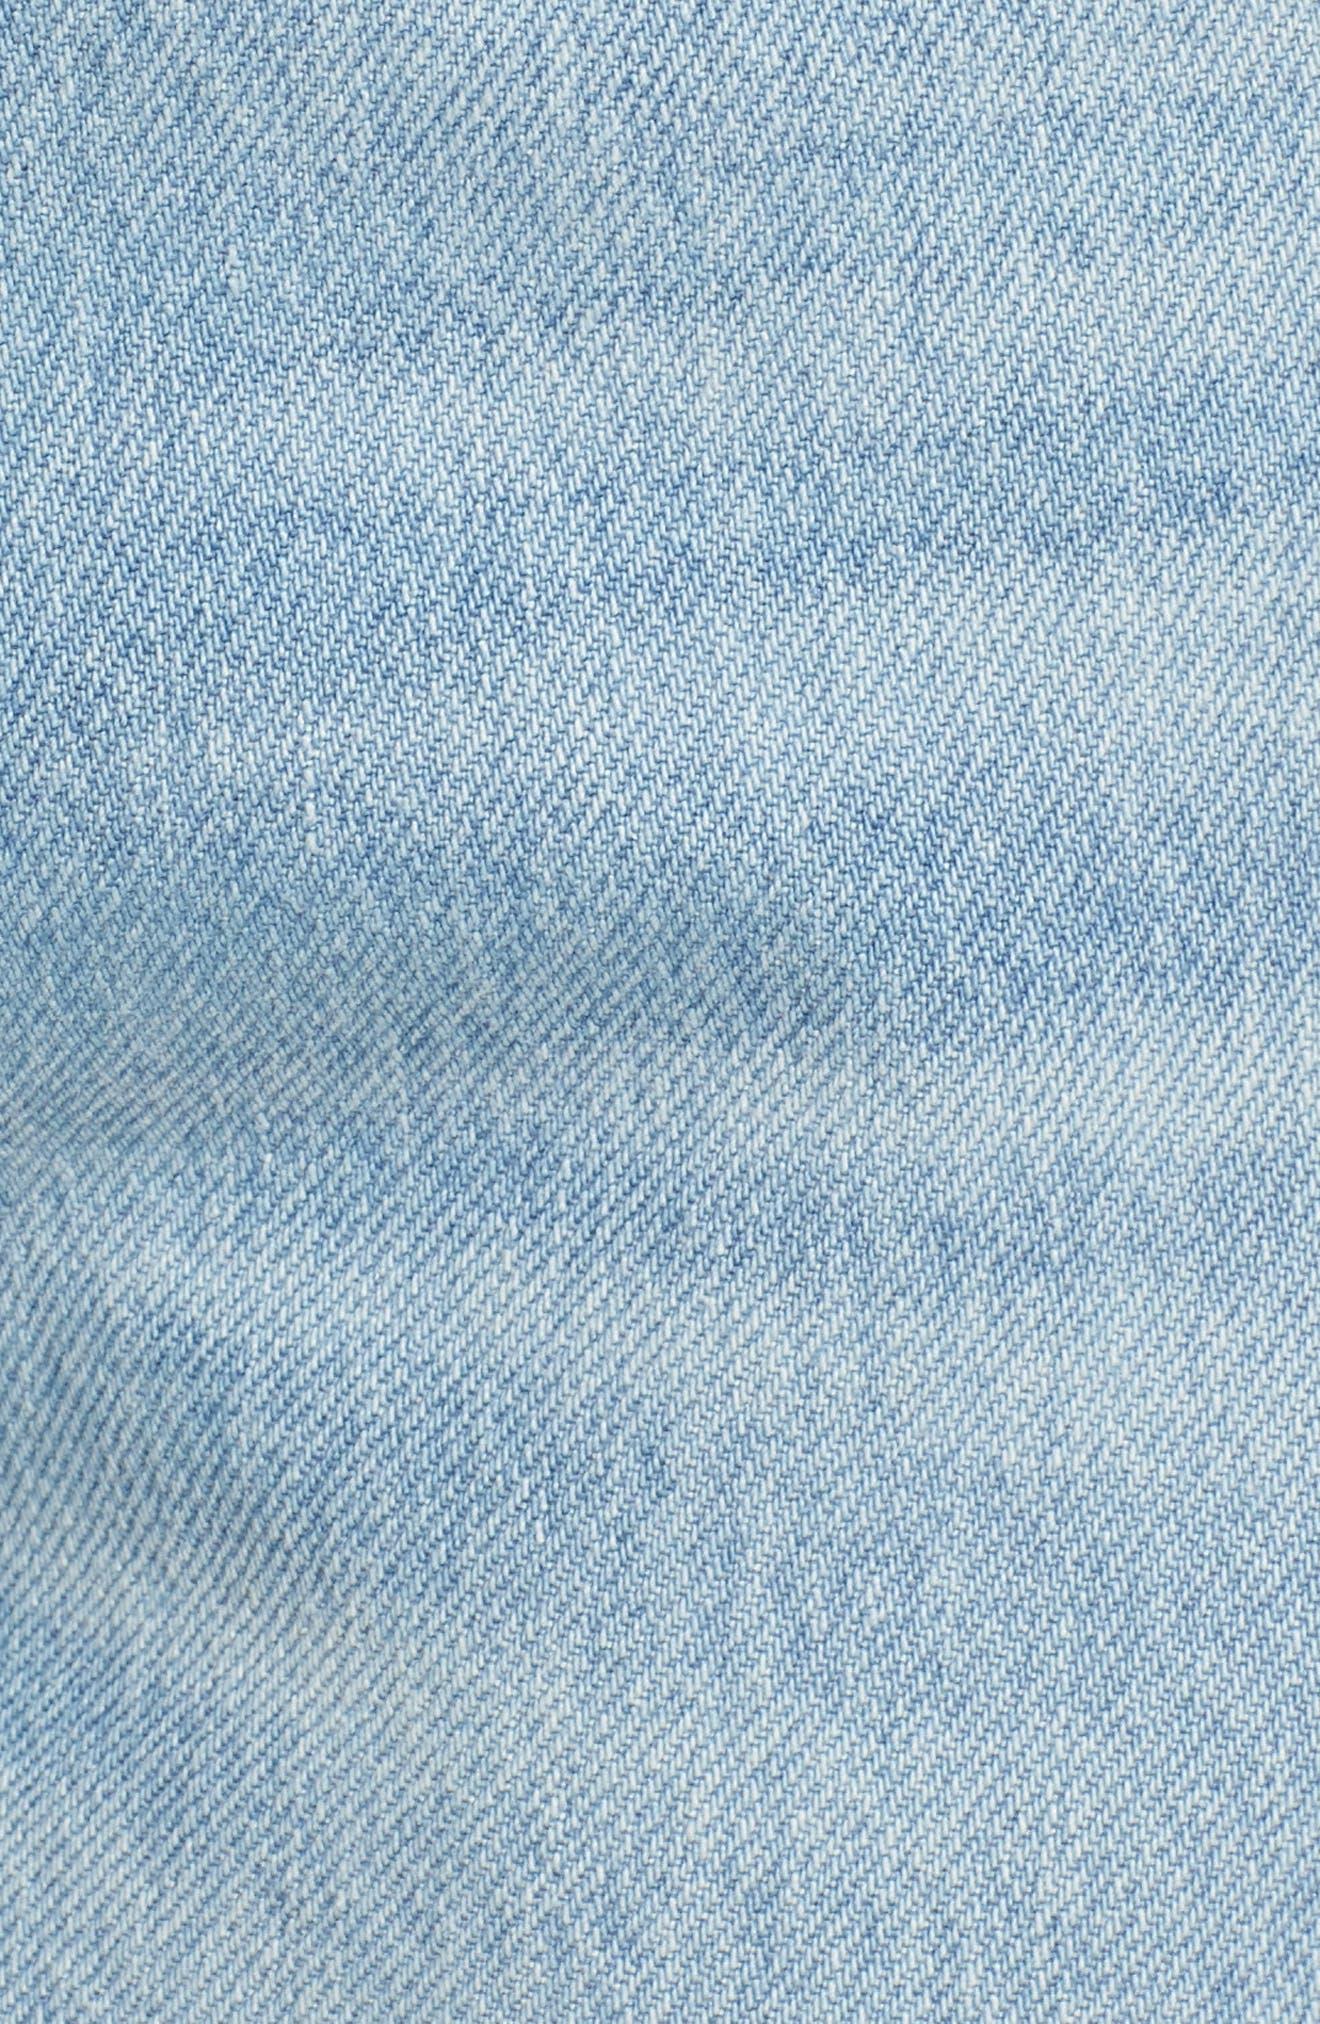 Jamie High Waist Ankle Jeans,                             Alternate thumbnail 6, color,                             Temper